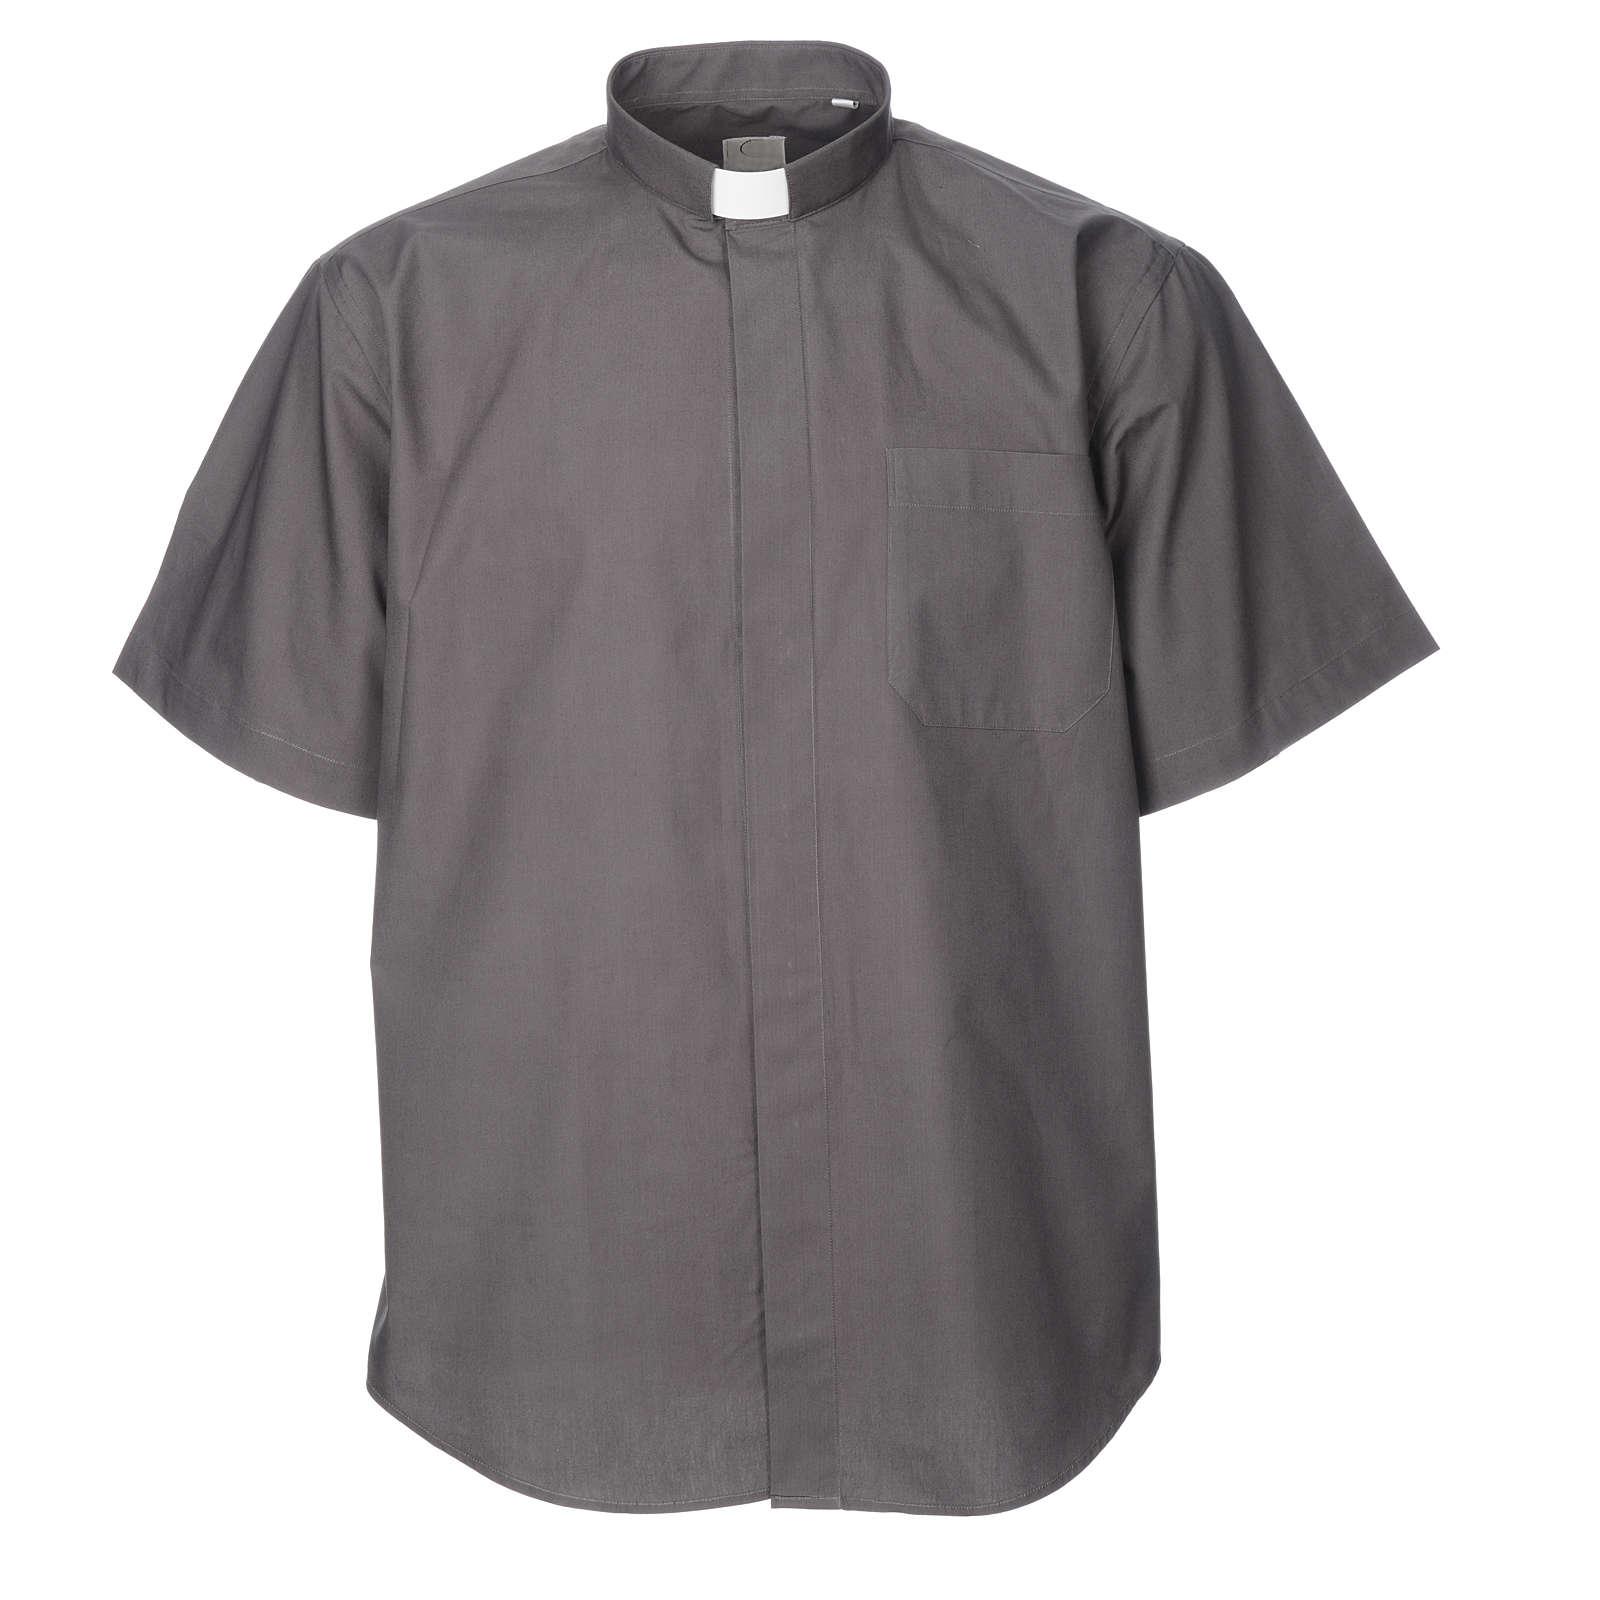 STOCK Camisa clegyman manga corta popelina gris oscuro 4